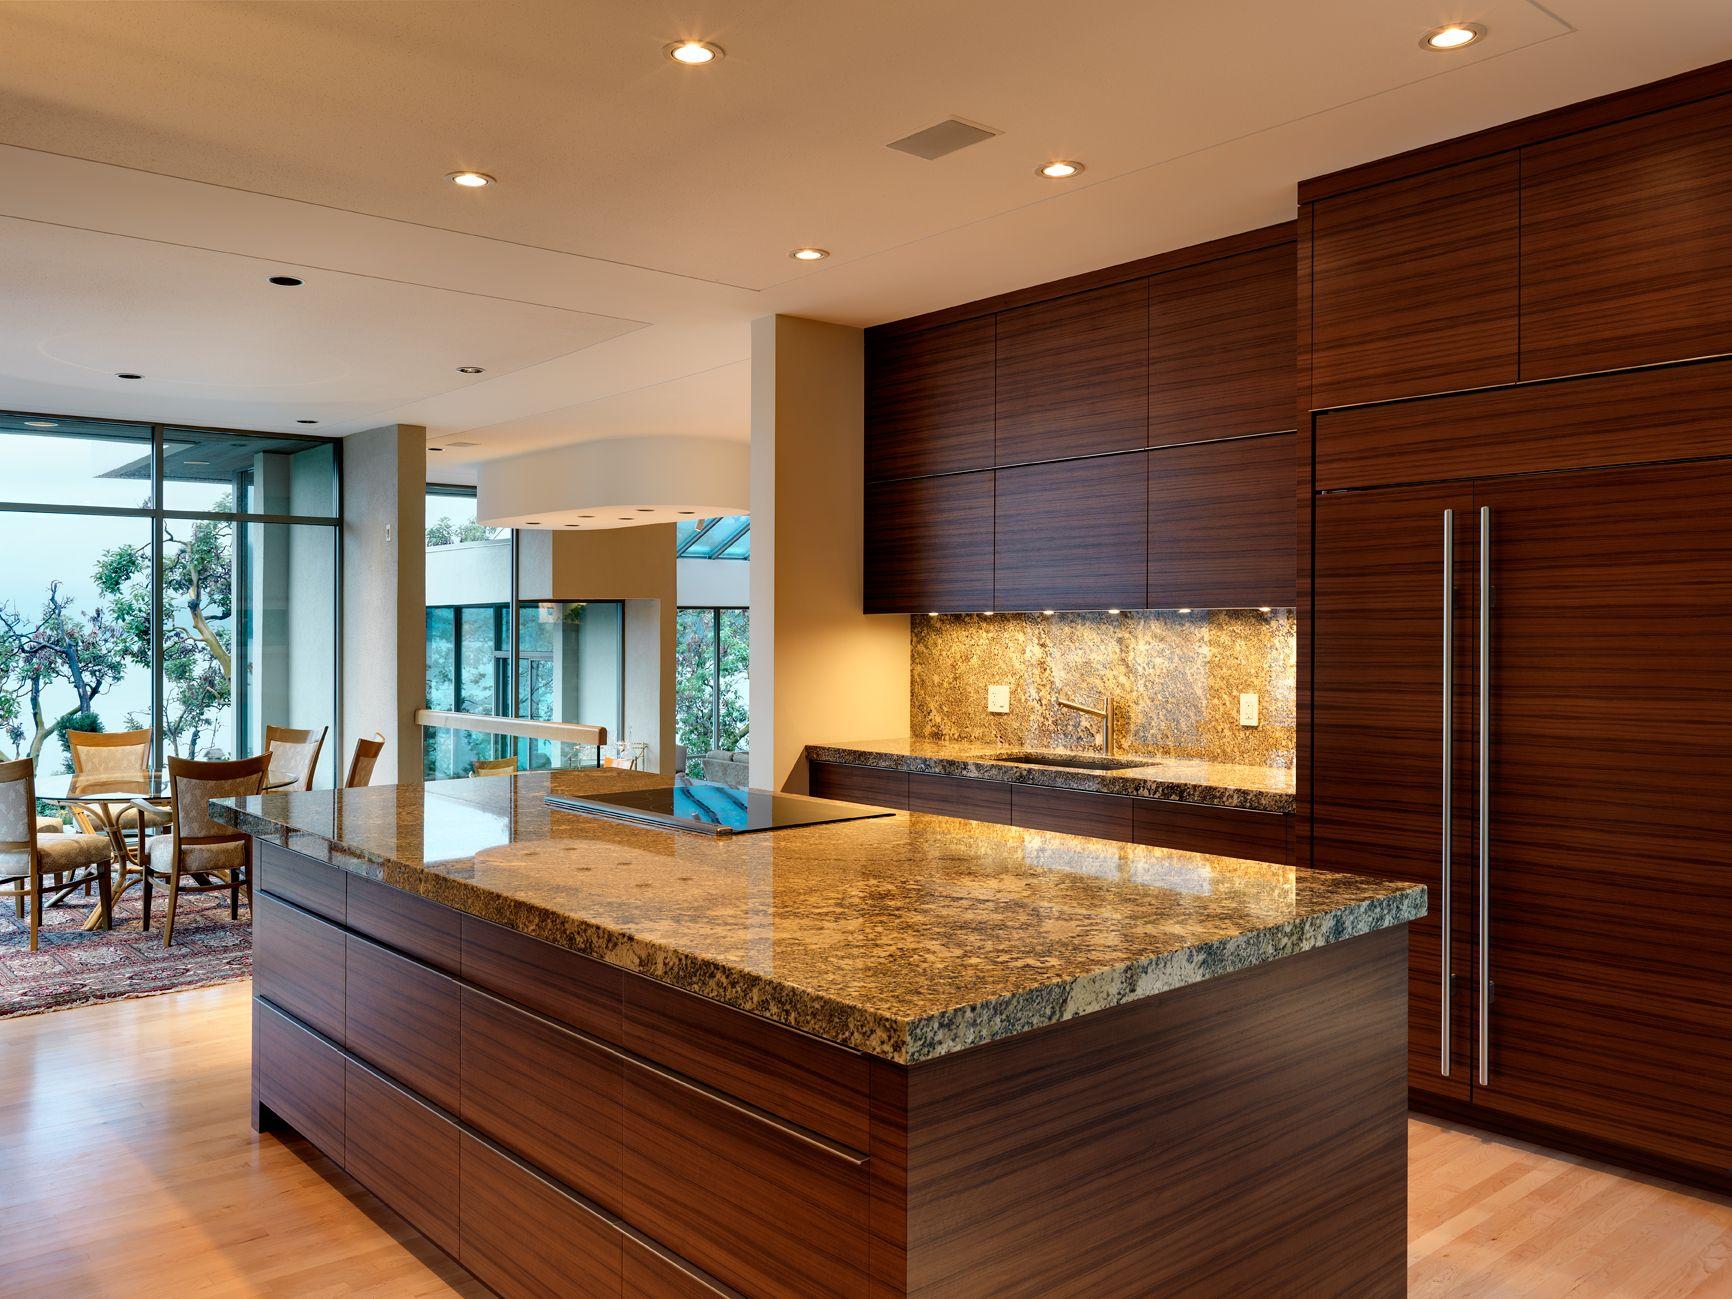 Kitchen Countertops In Star Beach Granite. Photo By Vince Klassen  Photographic